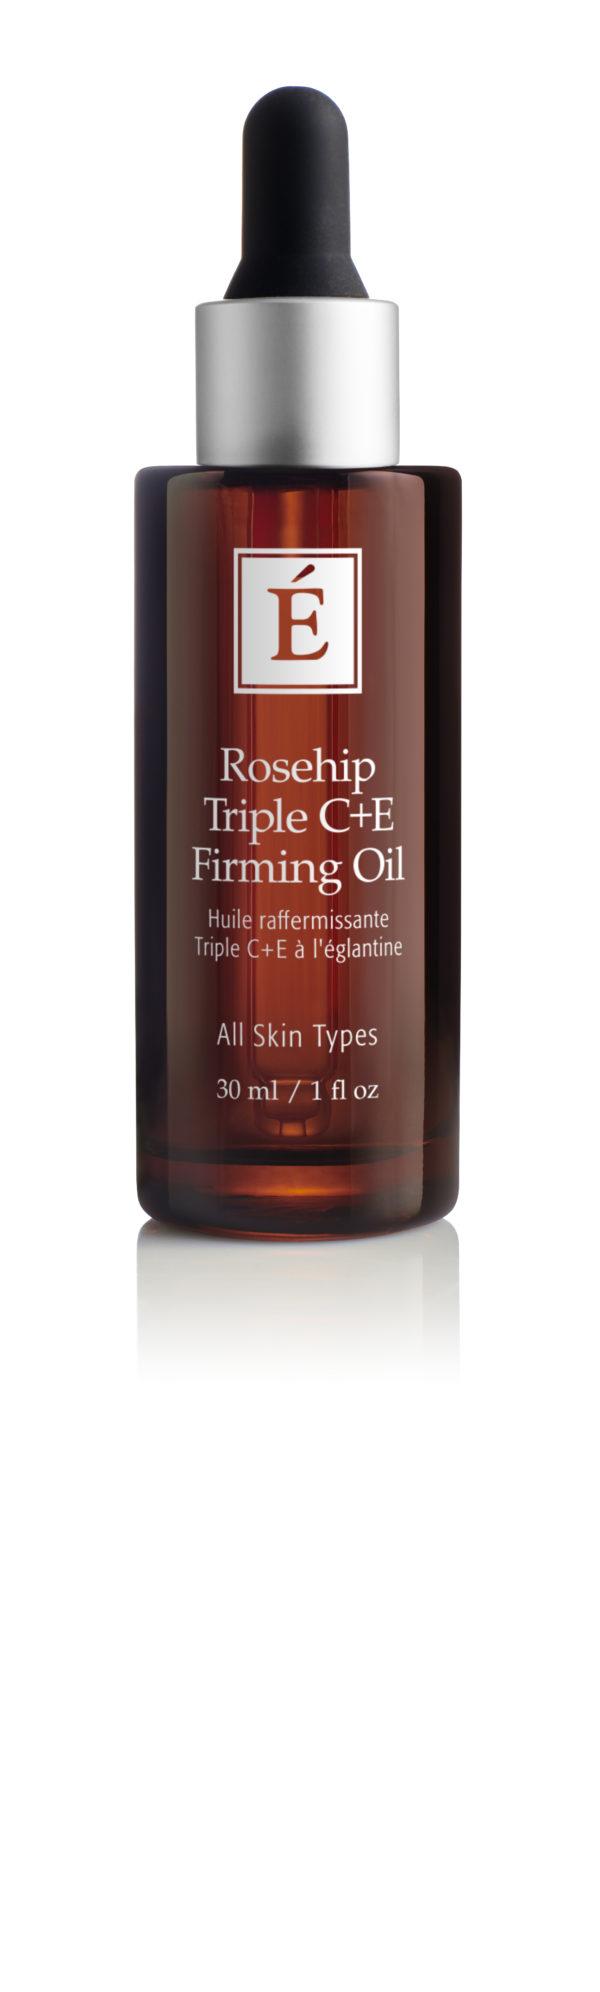 Eminence Rosehip Triple C+E Firming Oil